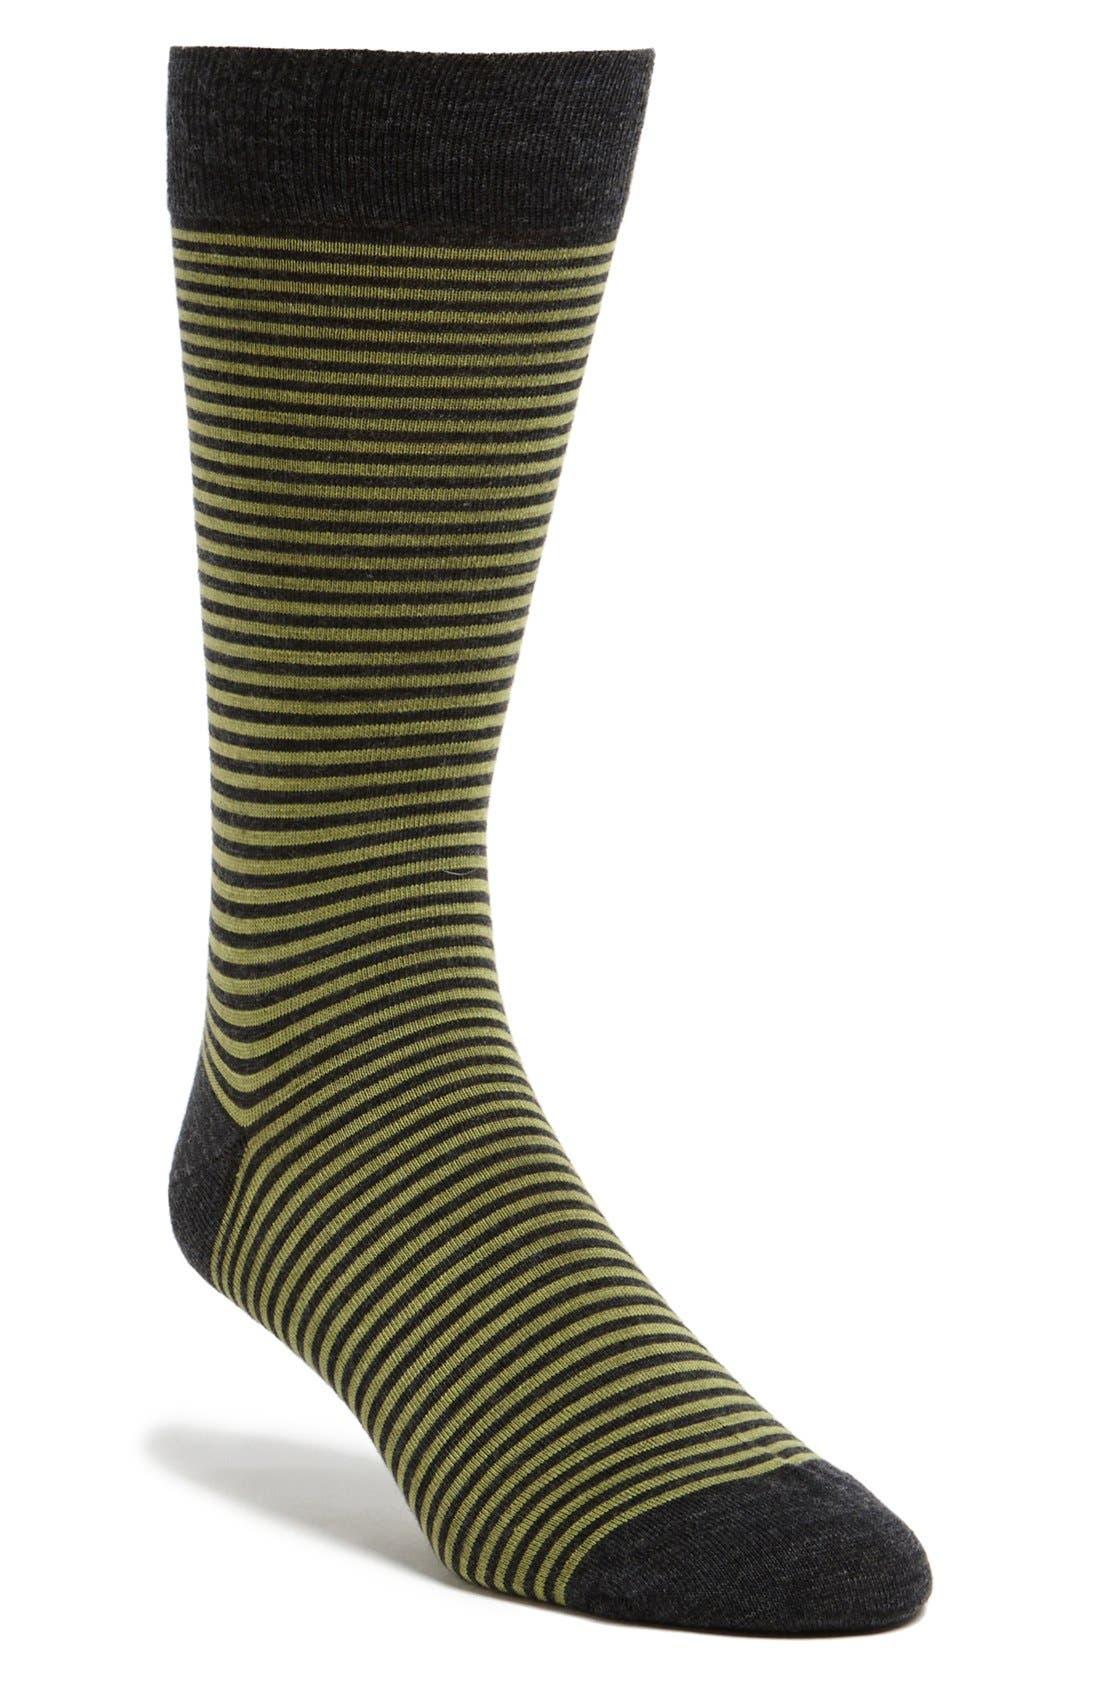 Main Image - Pantherella 'Whitechapel' Stripe Socks